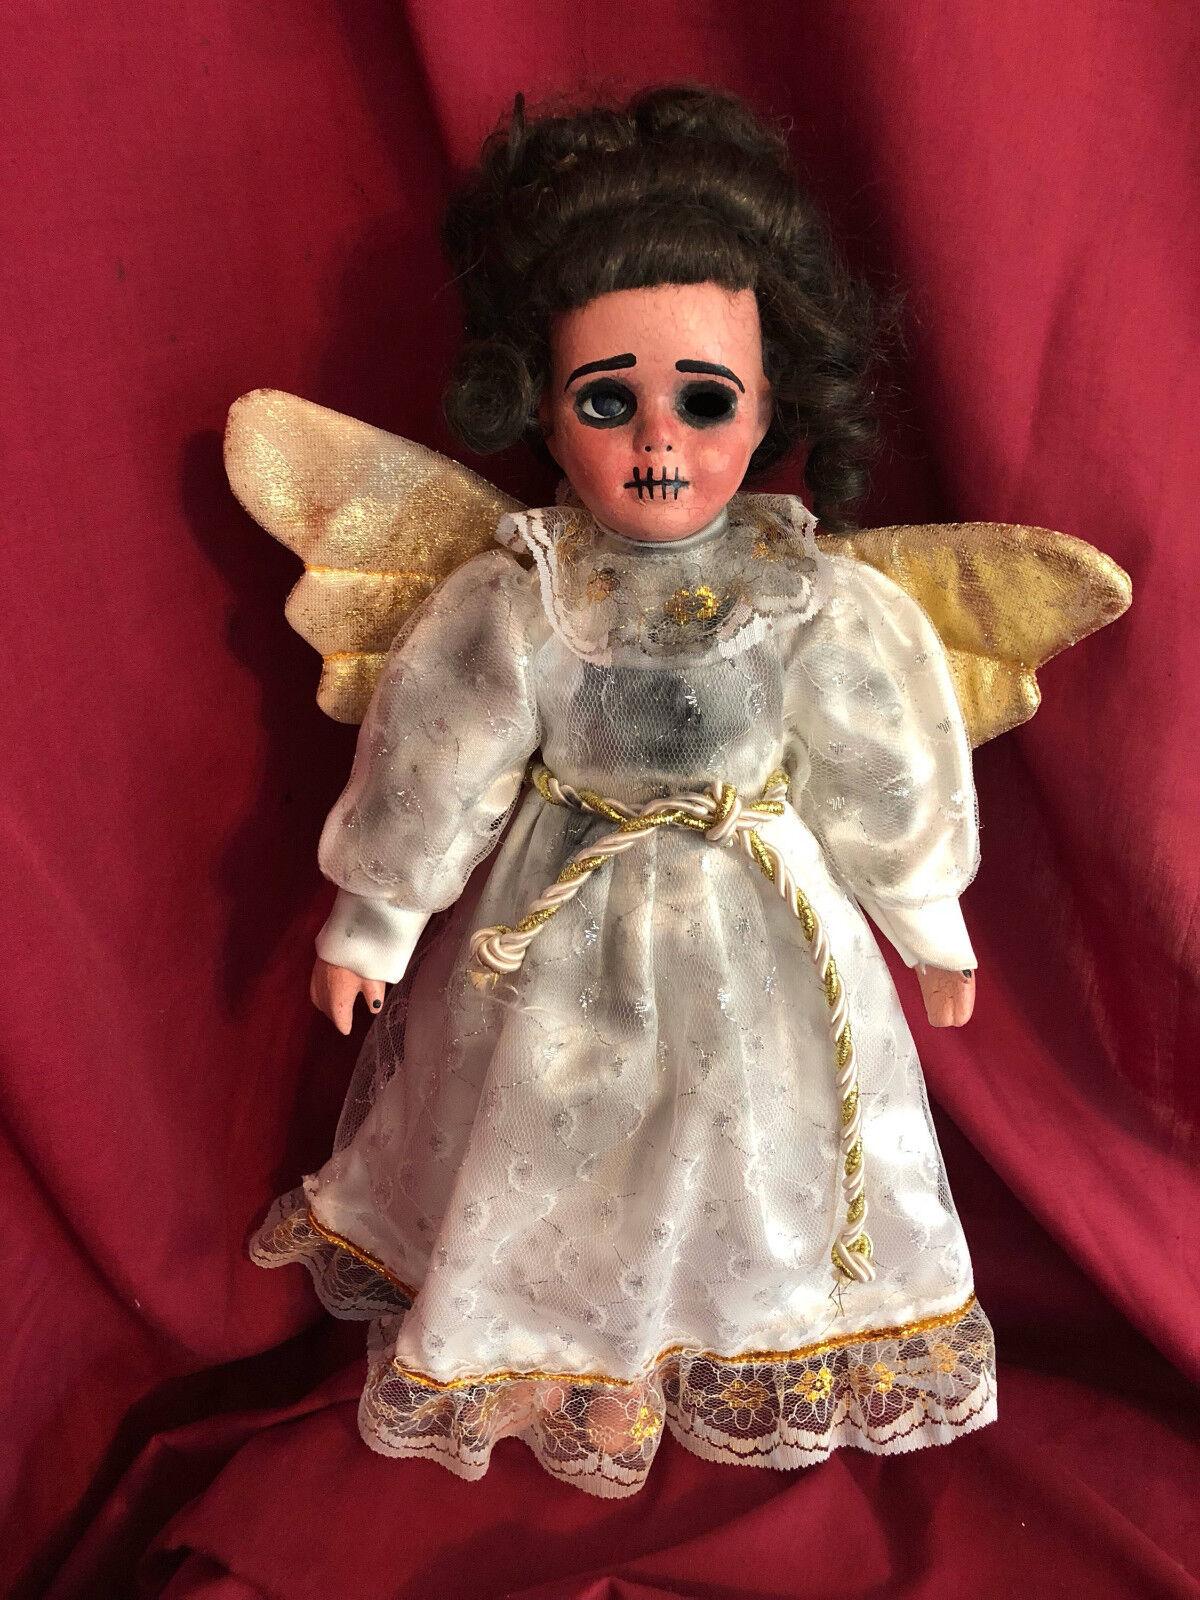 OOAK Flesh Crackle Angel Creepy Horror Doll Art by Christie Creepydolls